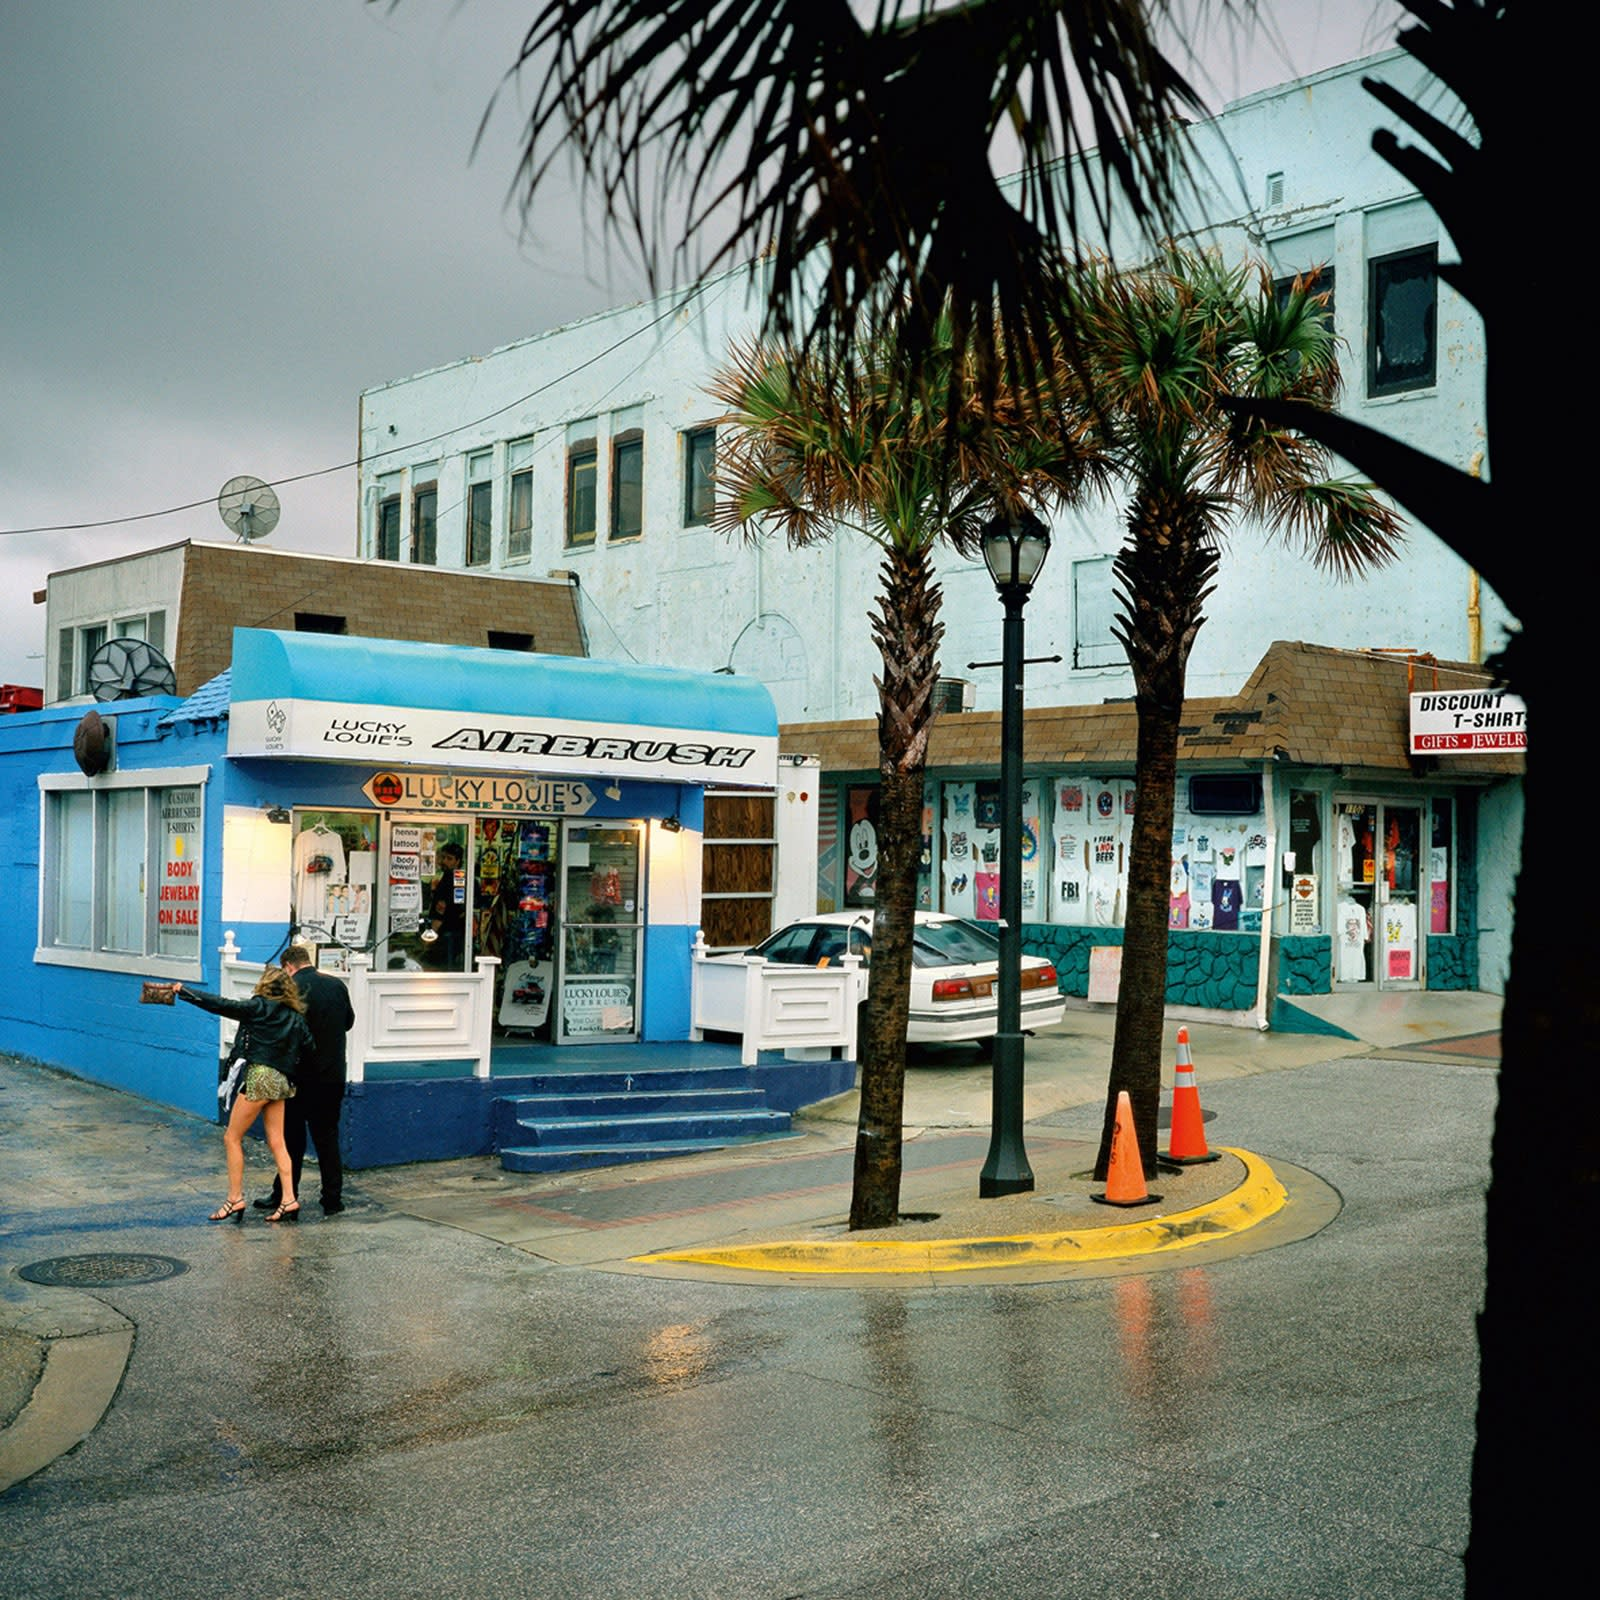 Jean-Christophe Béchet Daytona Beach, Floride #193 Tirage Ilfochrome (Cibachrome) Dim. papier: 40 x 50 cm